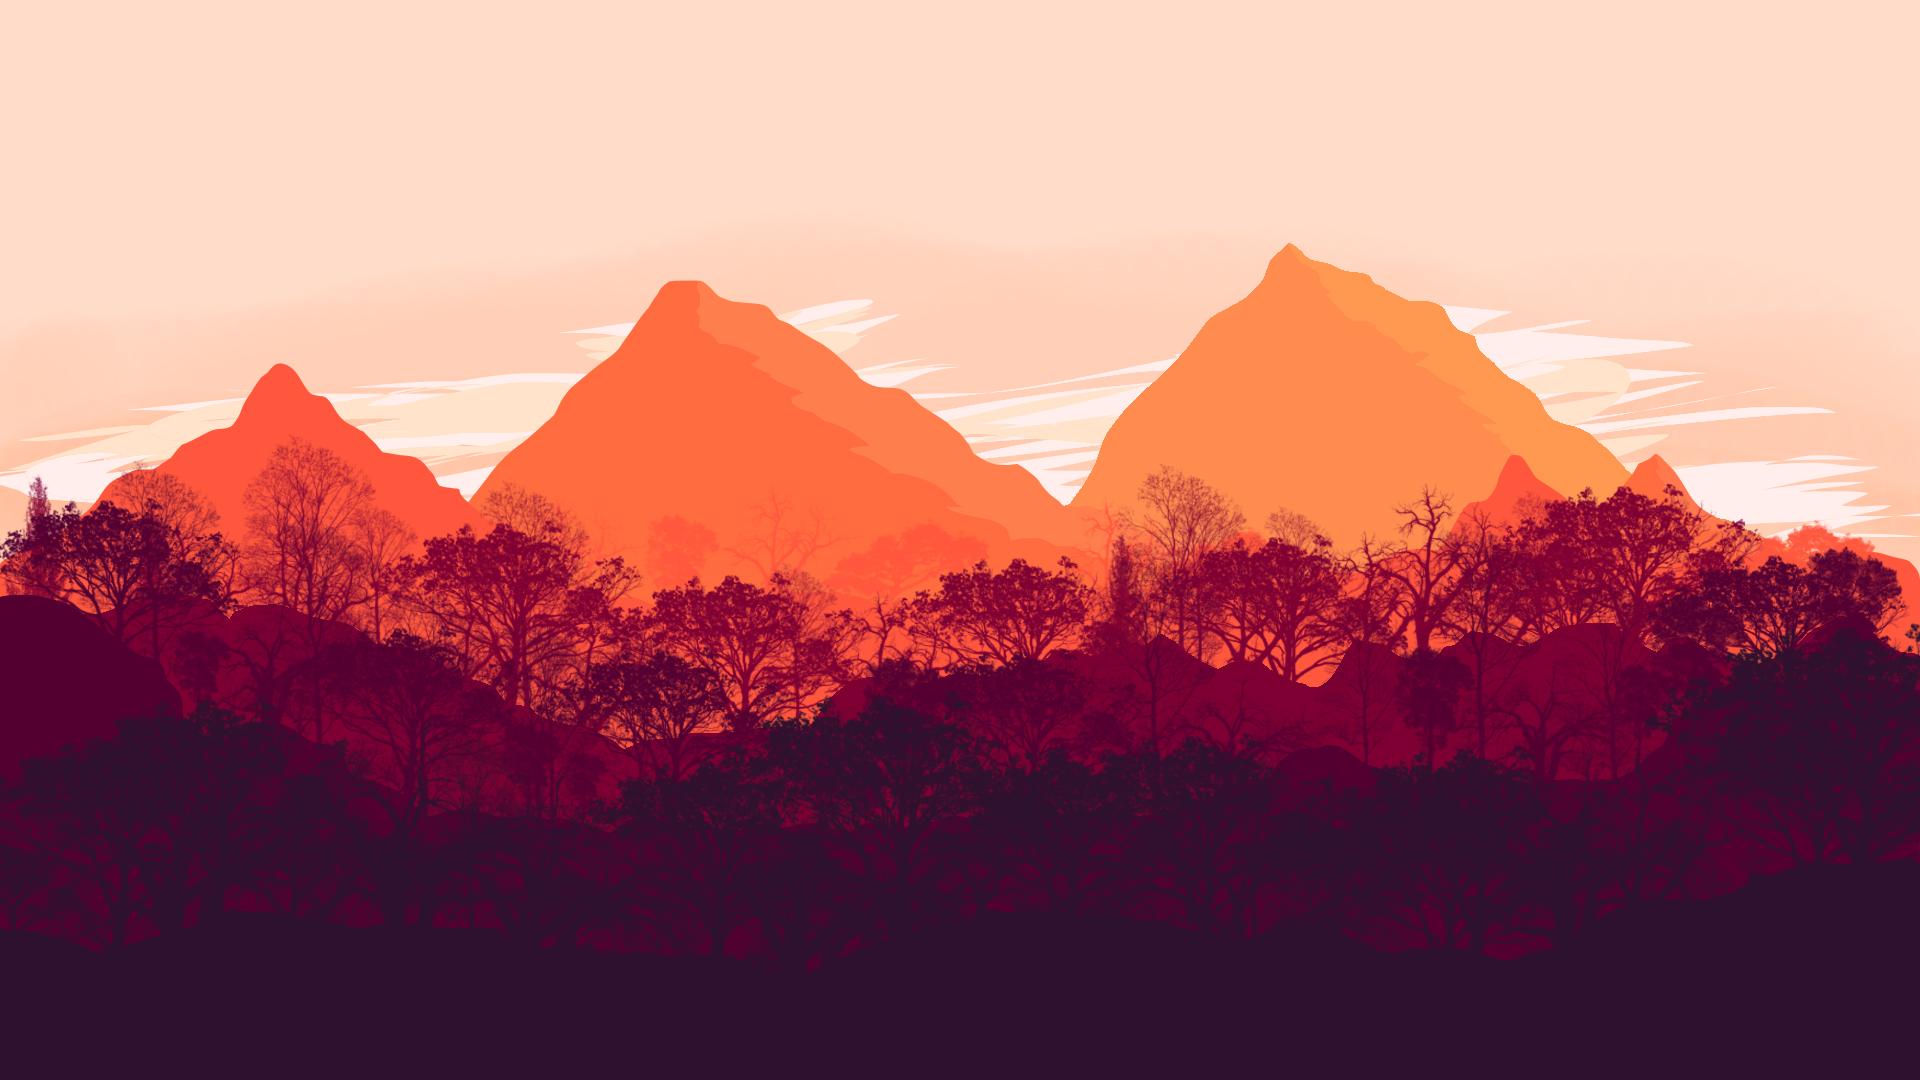 Wallpaper Forest Sunset Warm Colours Simple Minimalist